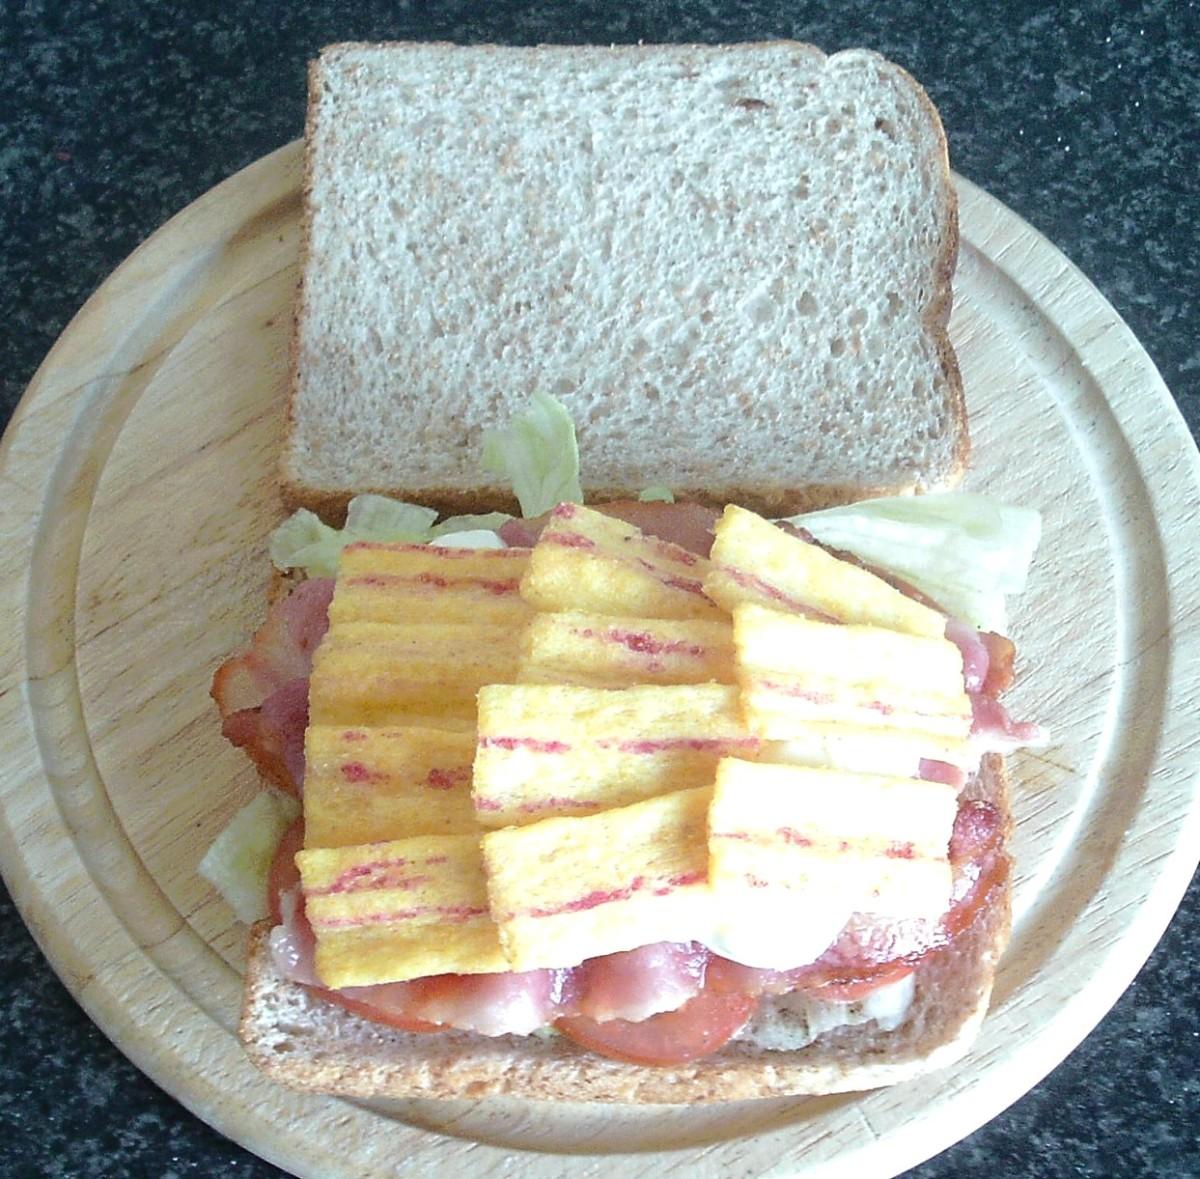 Crispy bacon corn snacks are arranged on top of garlic mayo